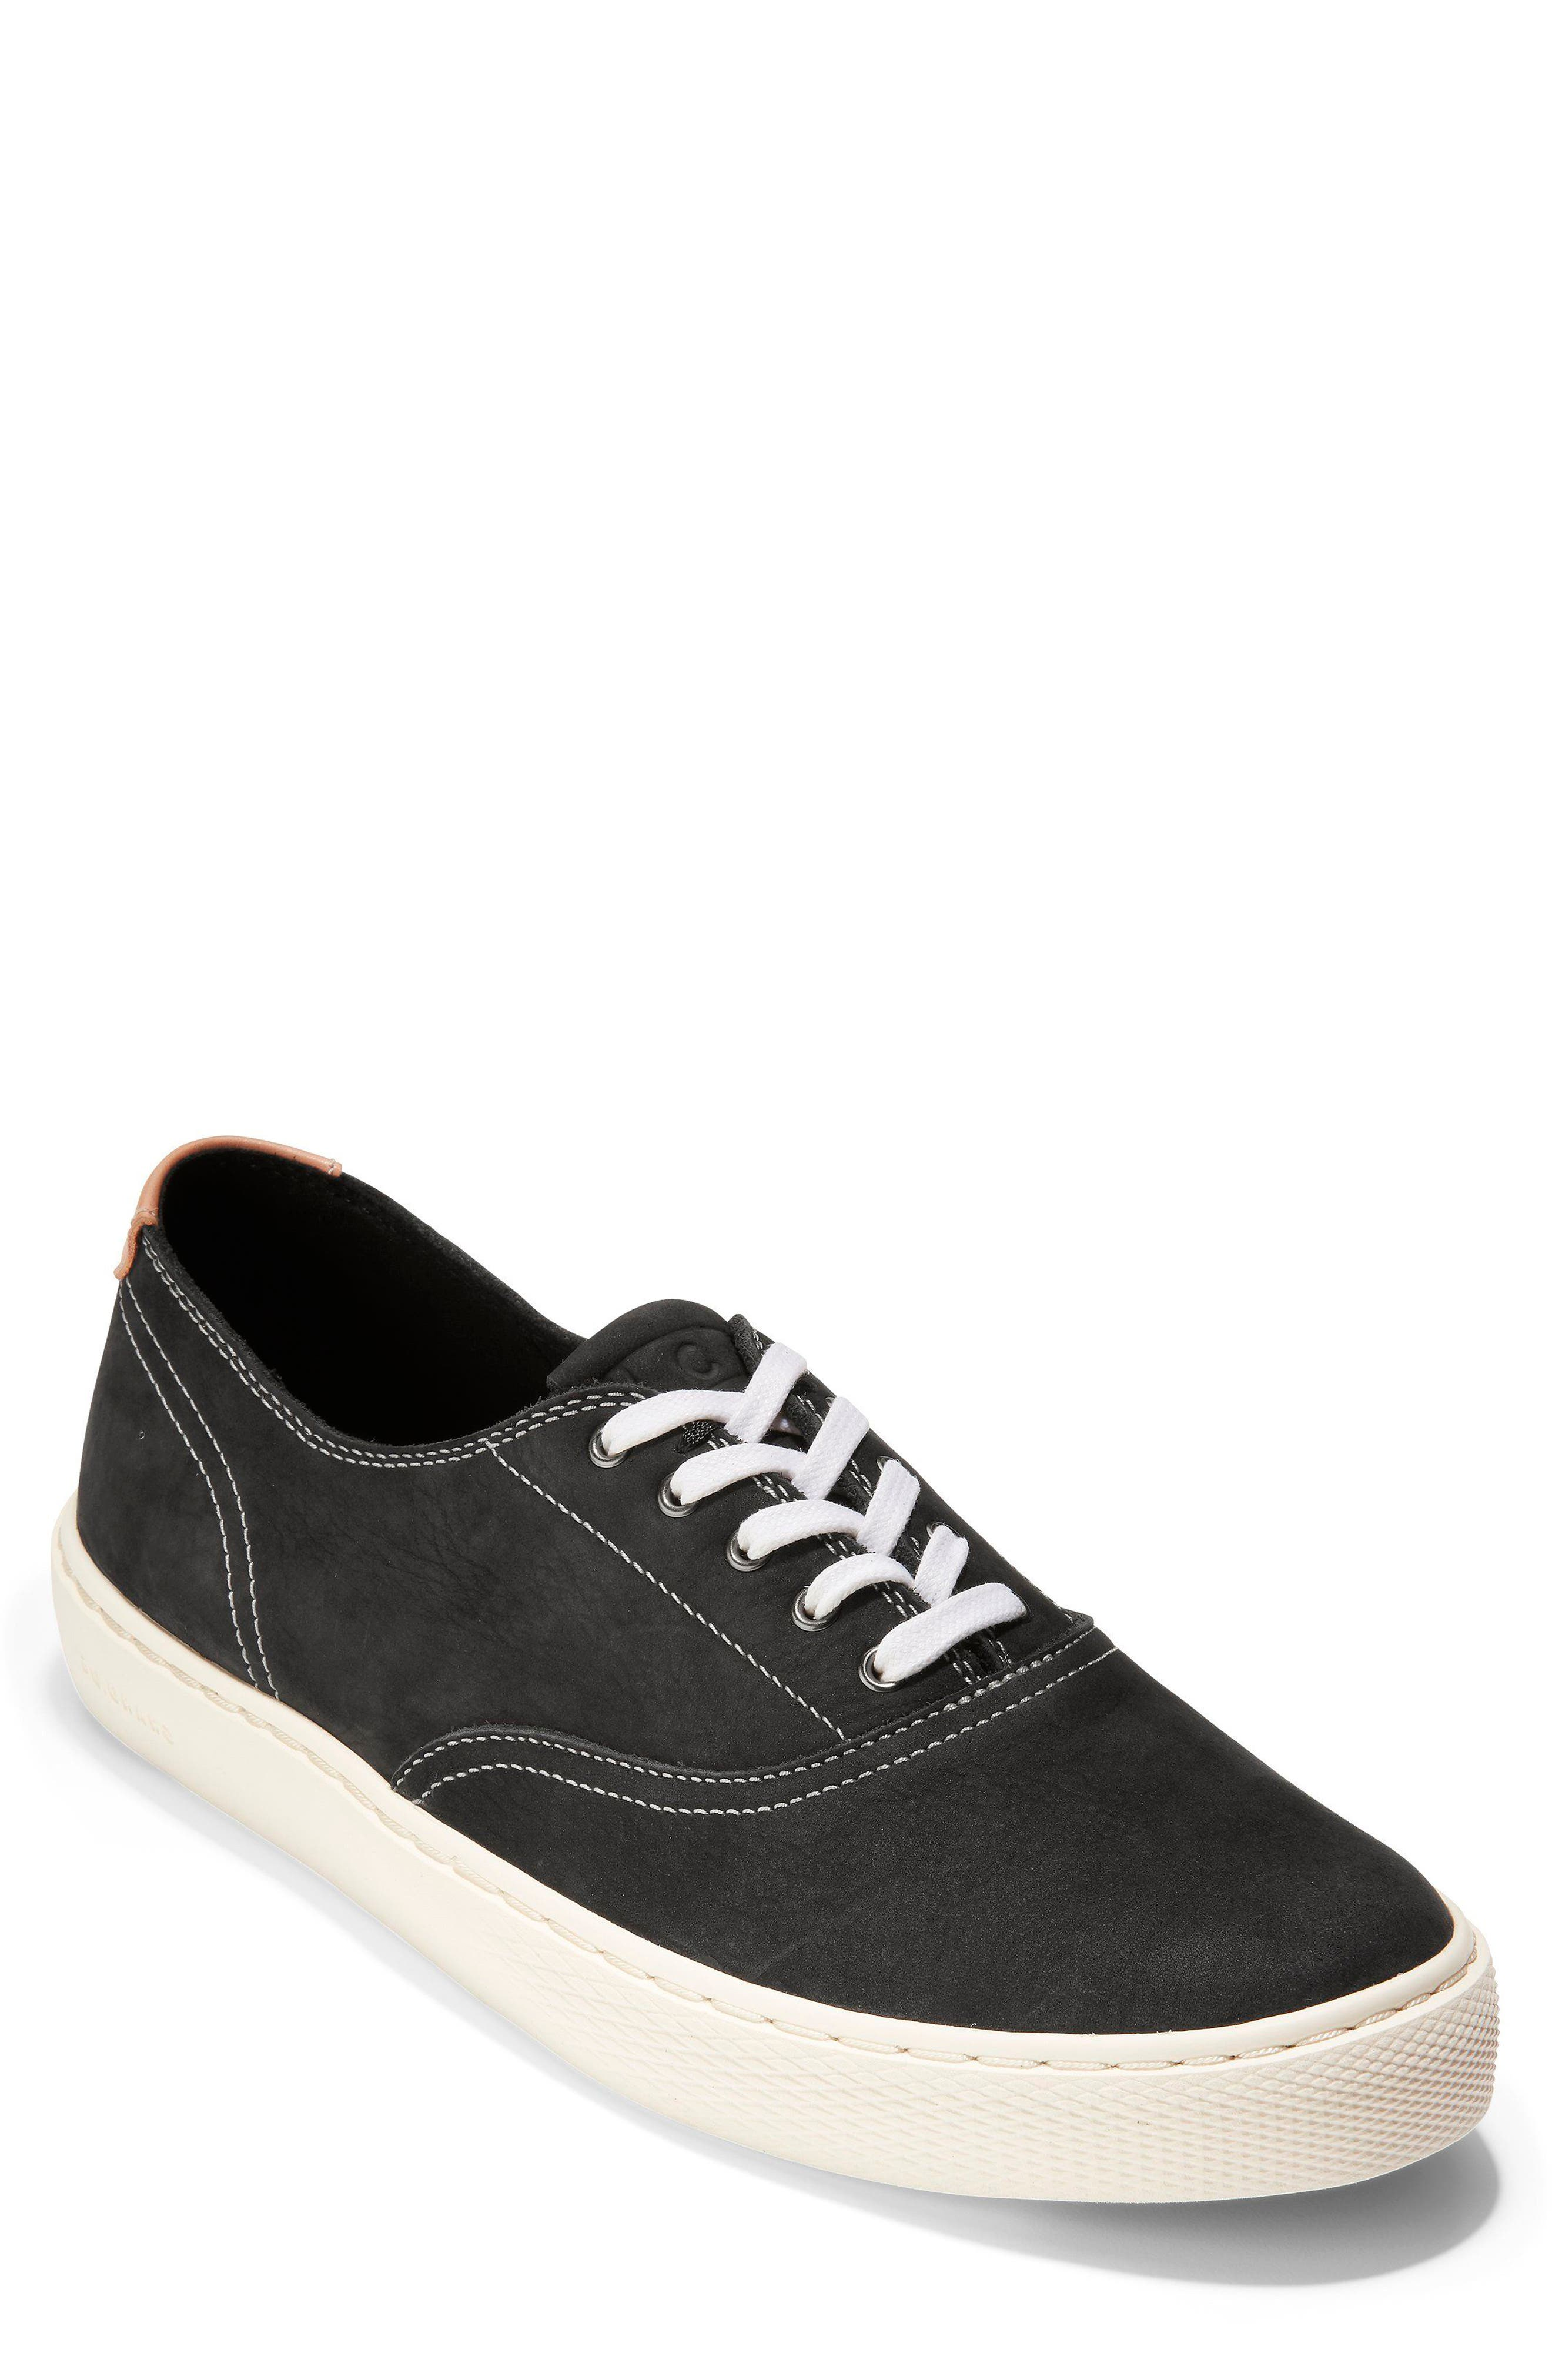 GrandPro Deck Low Top Sneaker,                             Main thumbnail 1, color,                             001